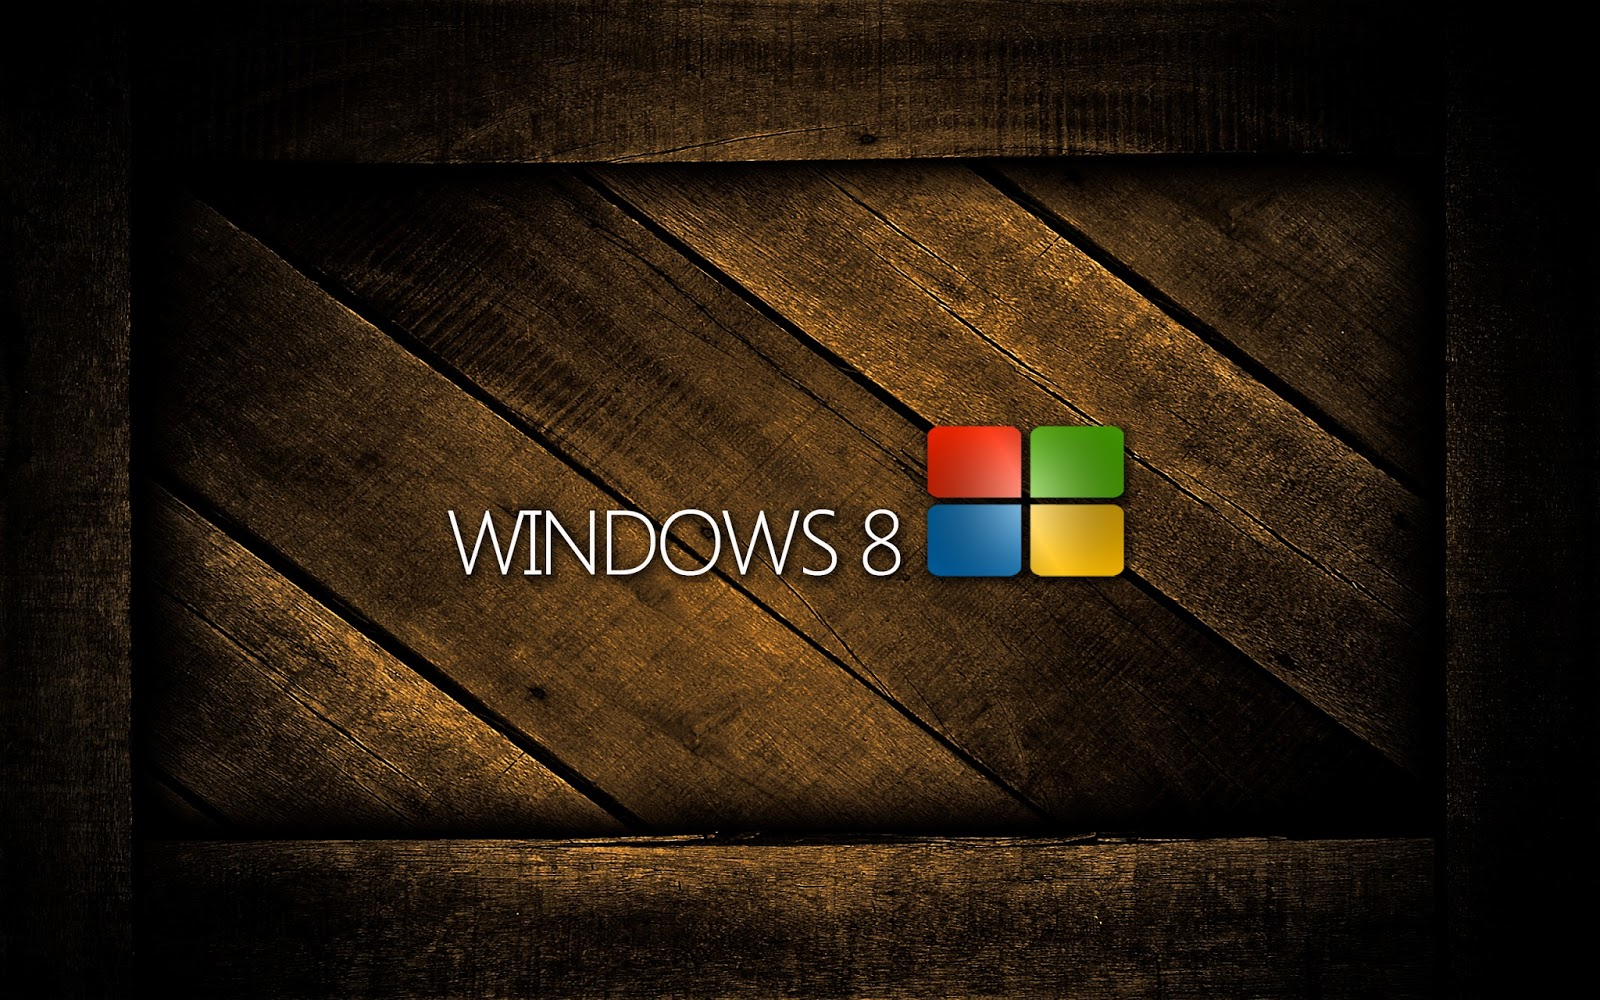 Windows 7 3D Wallpaper Free Download (30 Wallpapers